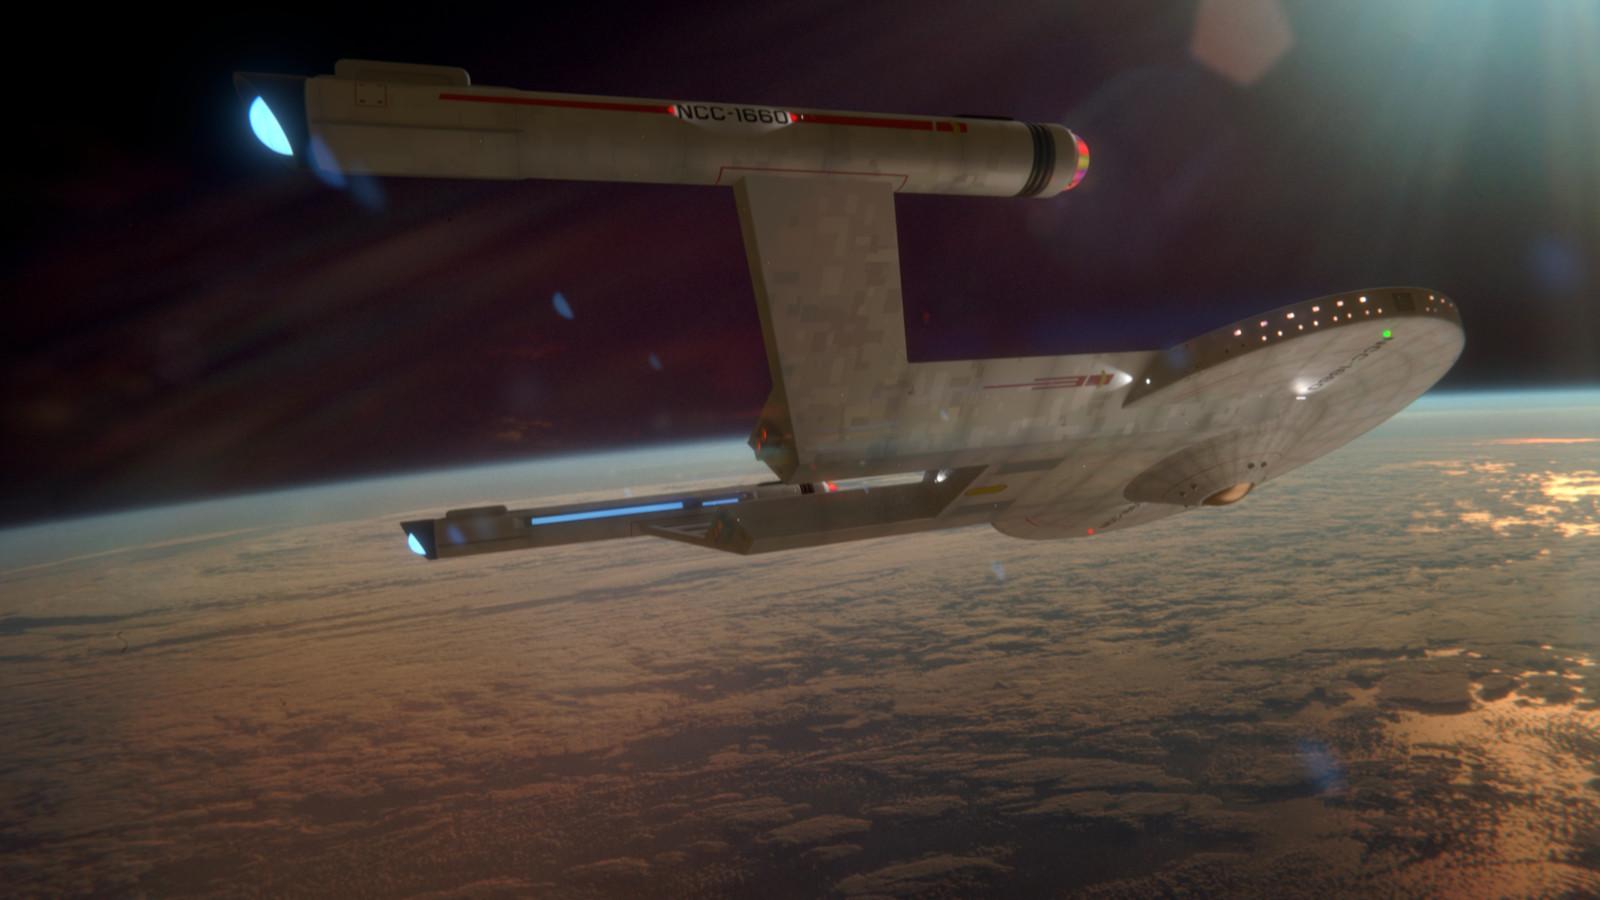 Background by NASA